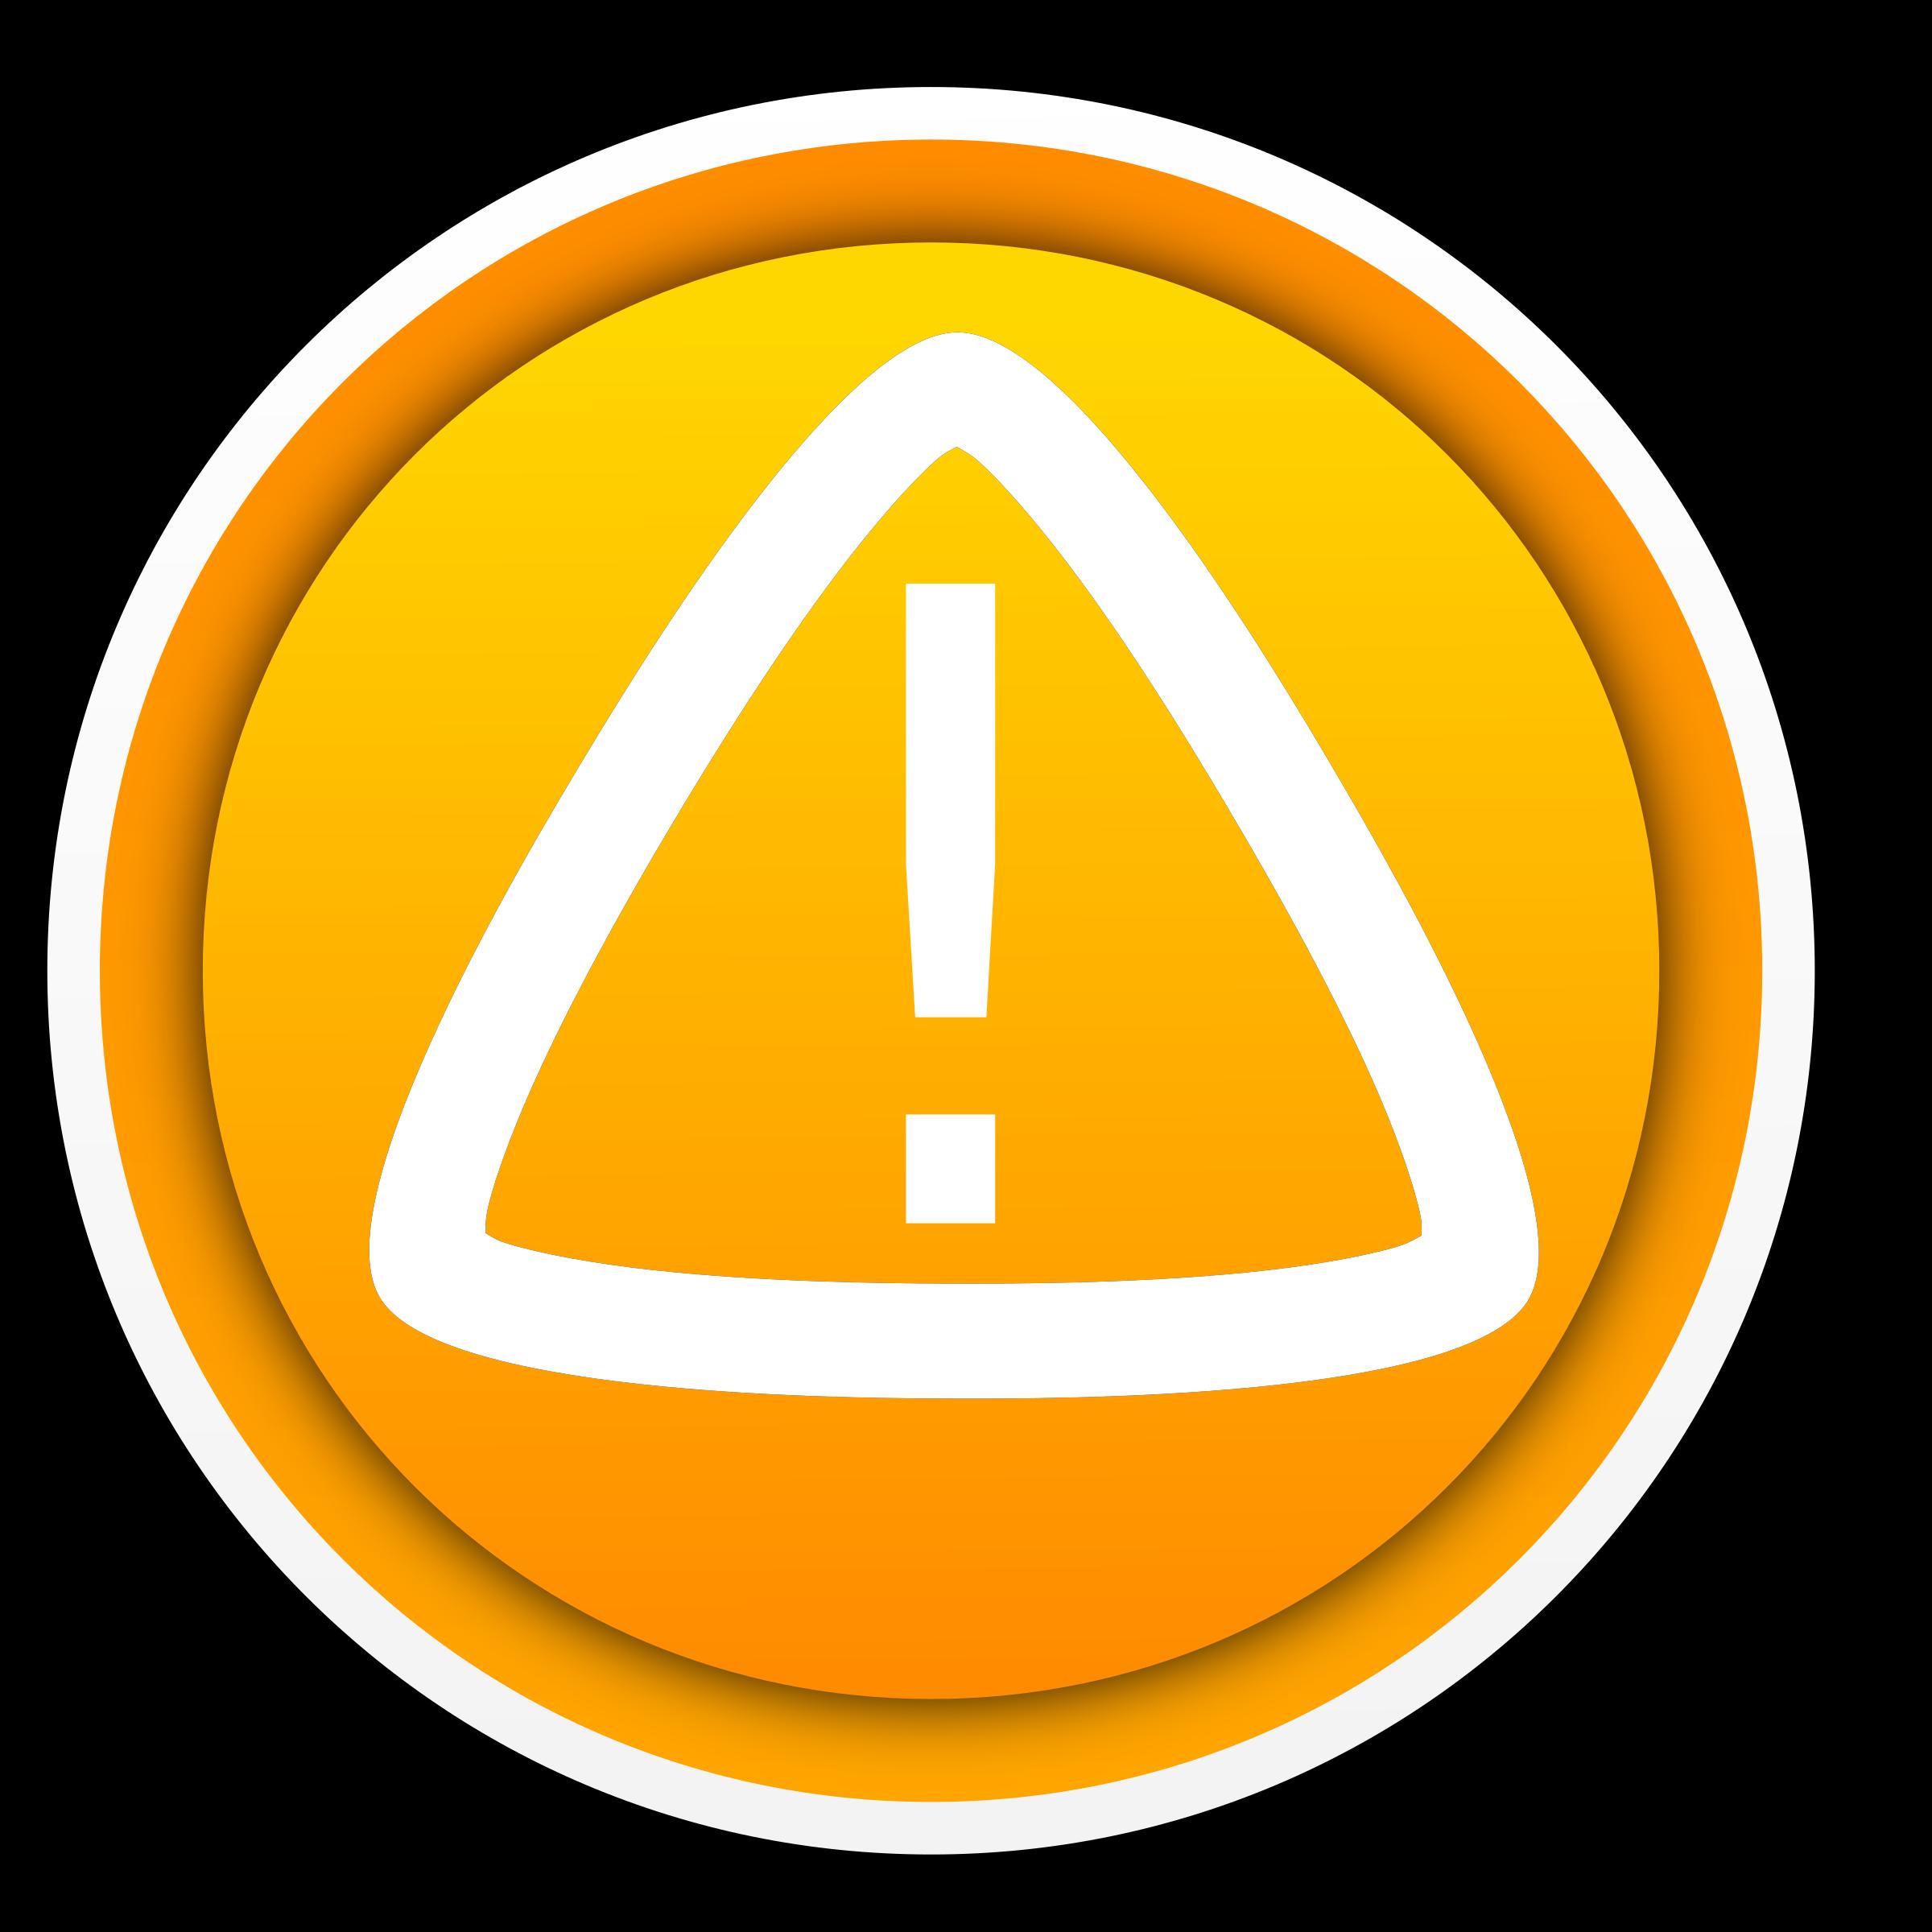 Warning advertencia big image. Button clipart boton